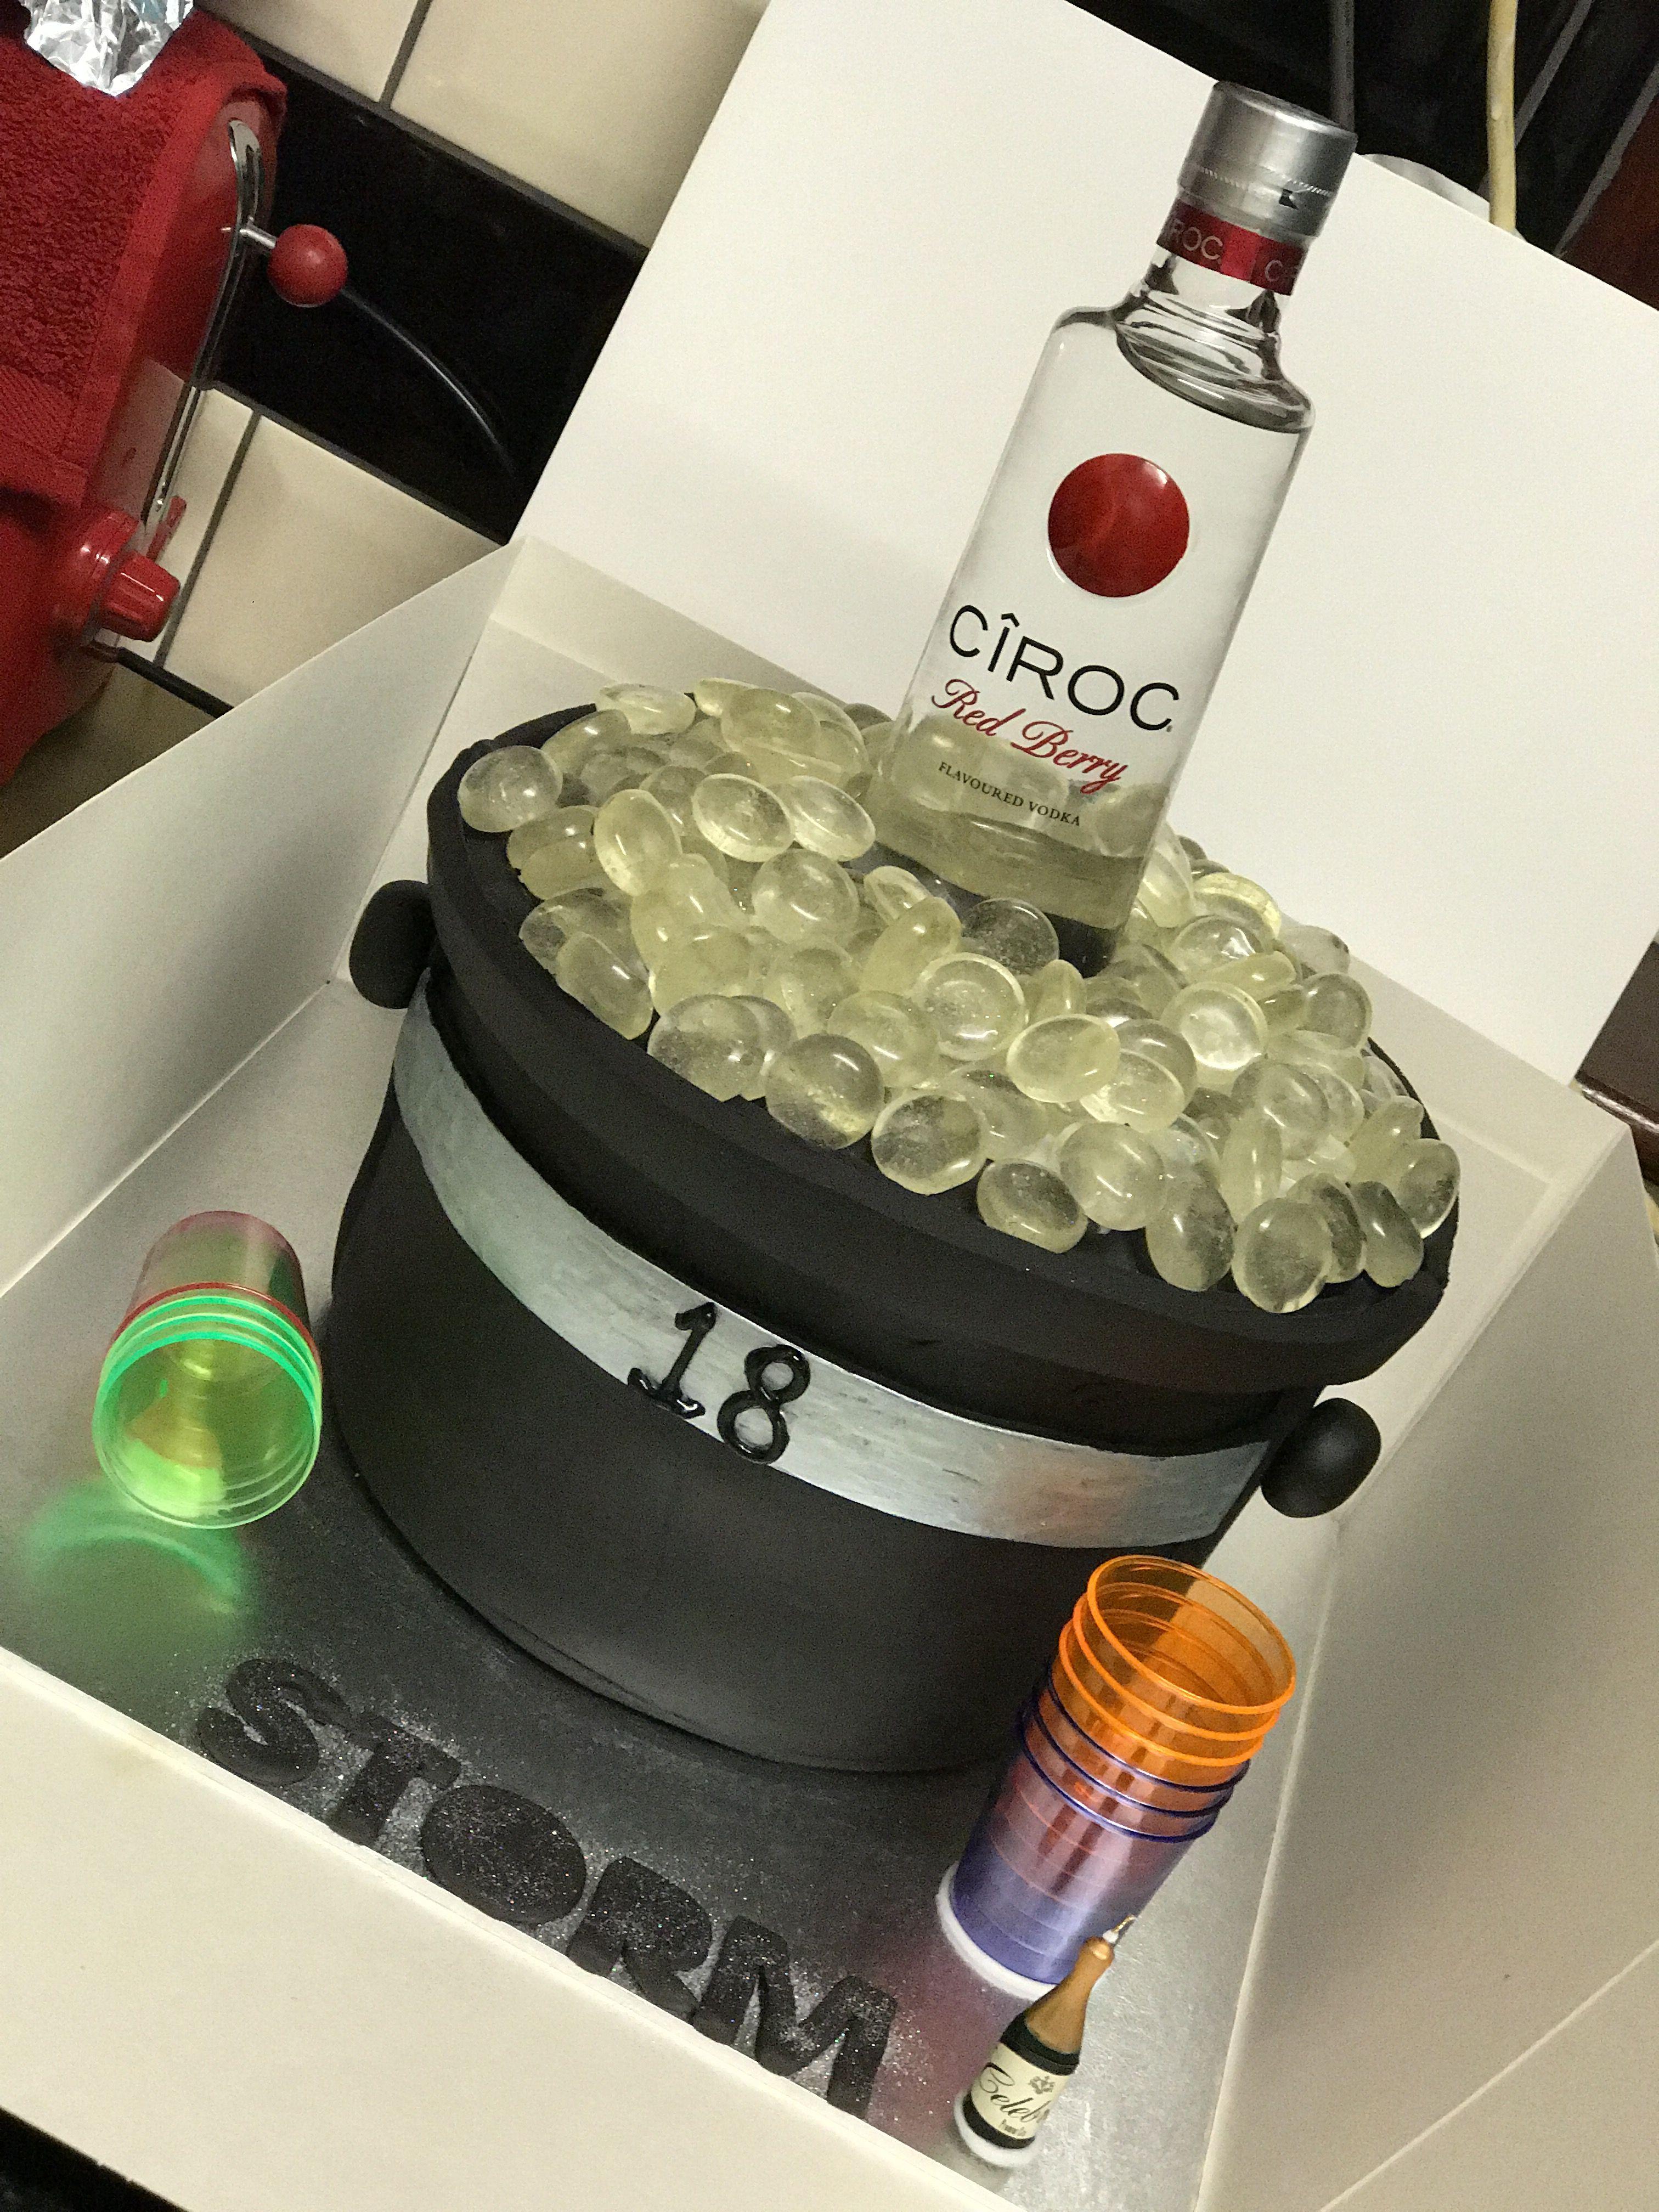 Fabulous Ciroc Cake In A Bucket Of Ice Cake Designs Birthday Cake Personalised Birthday Cards Veneteletsinfo